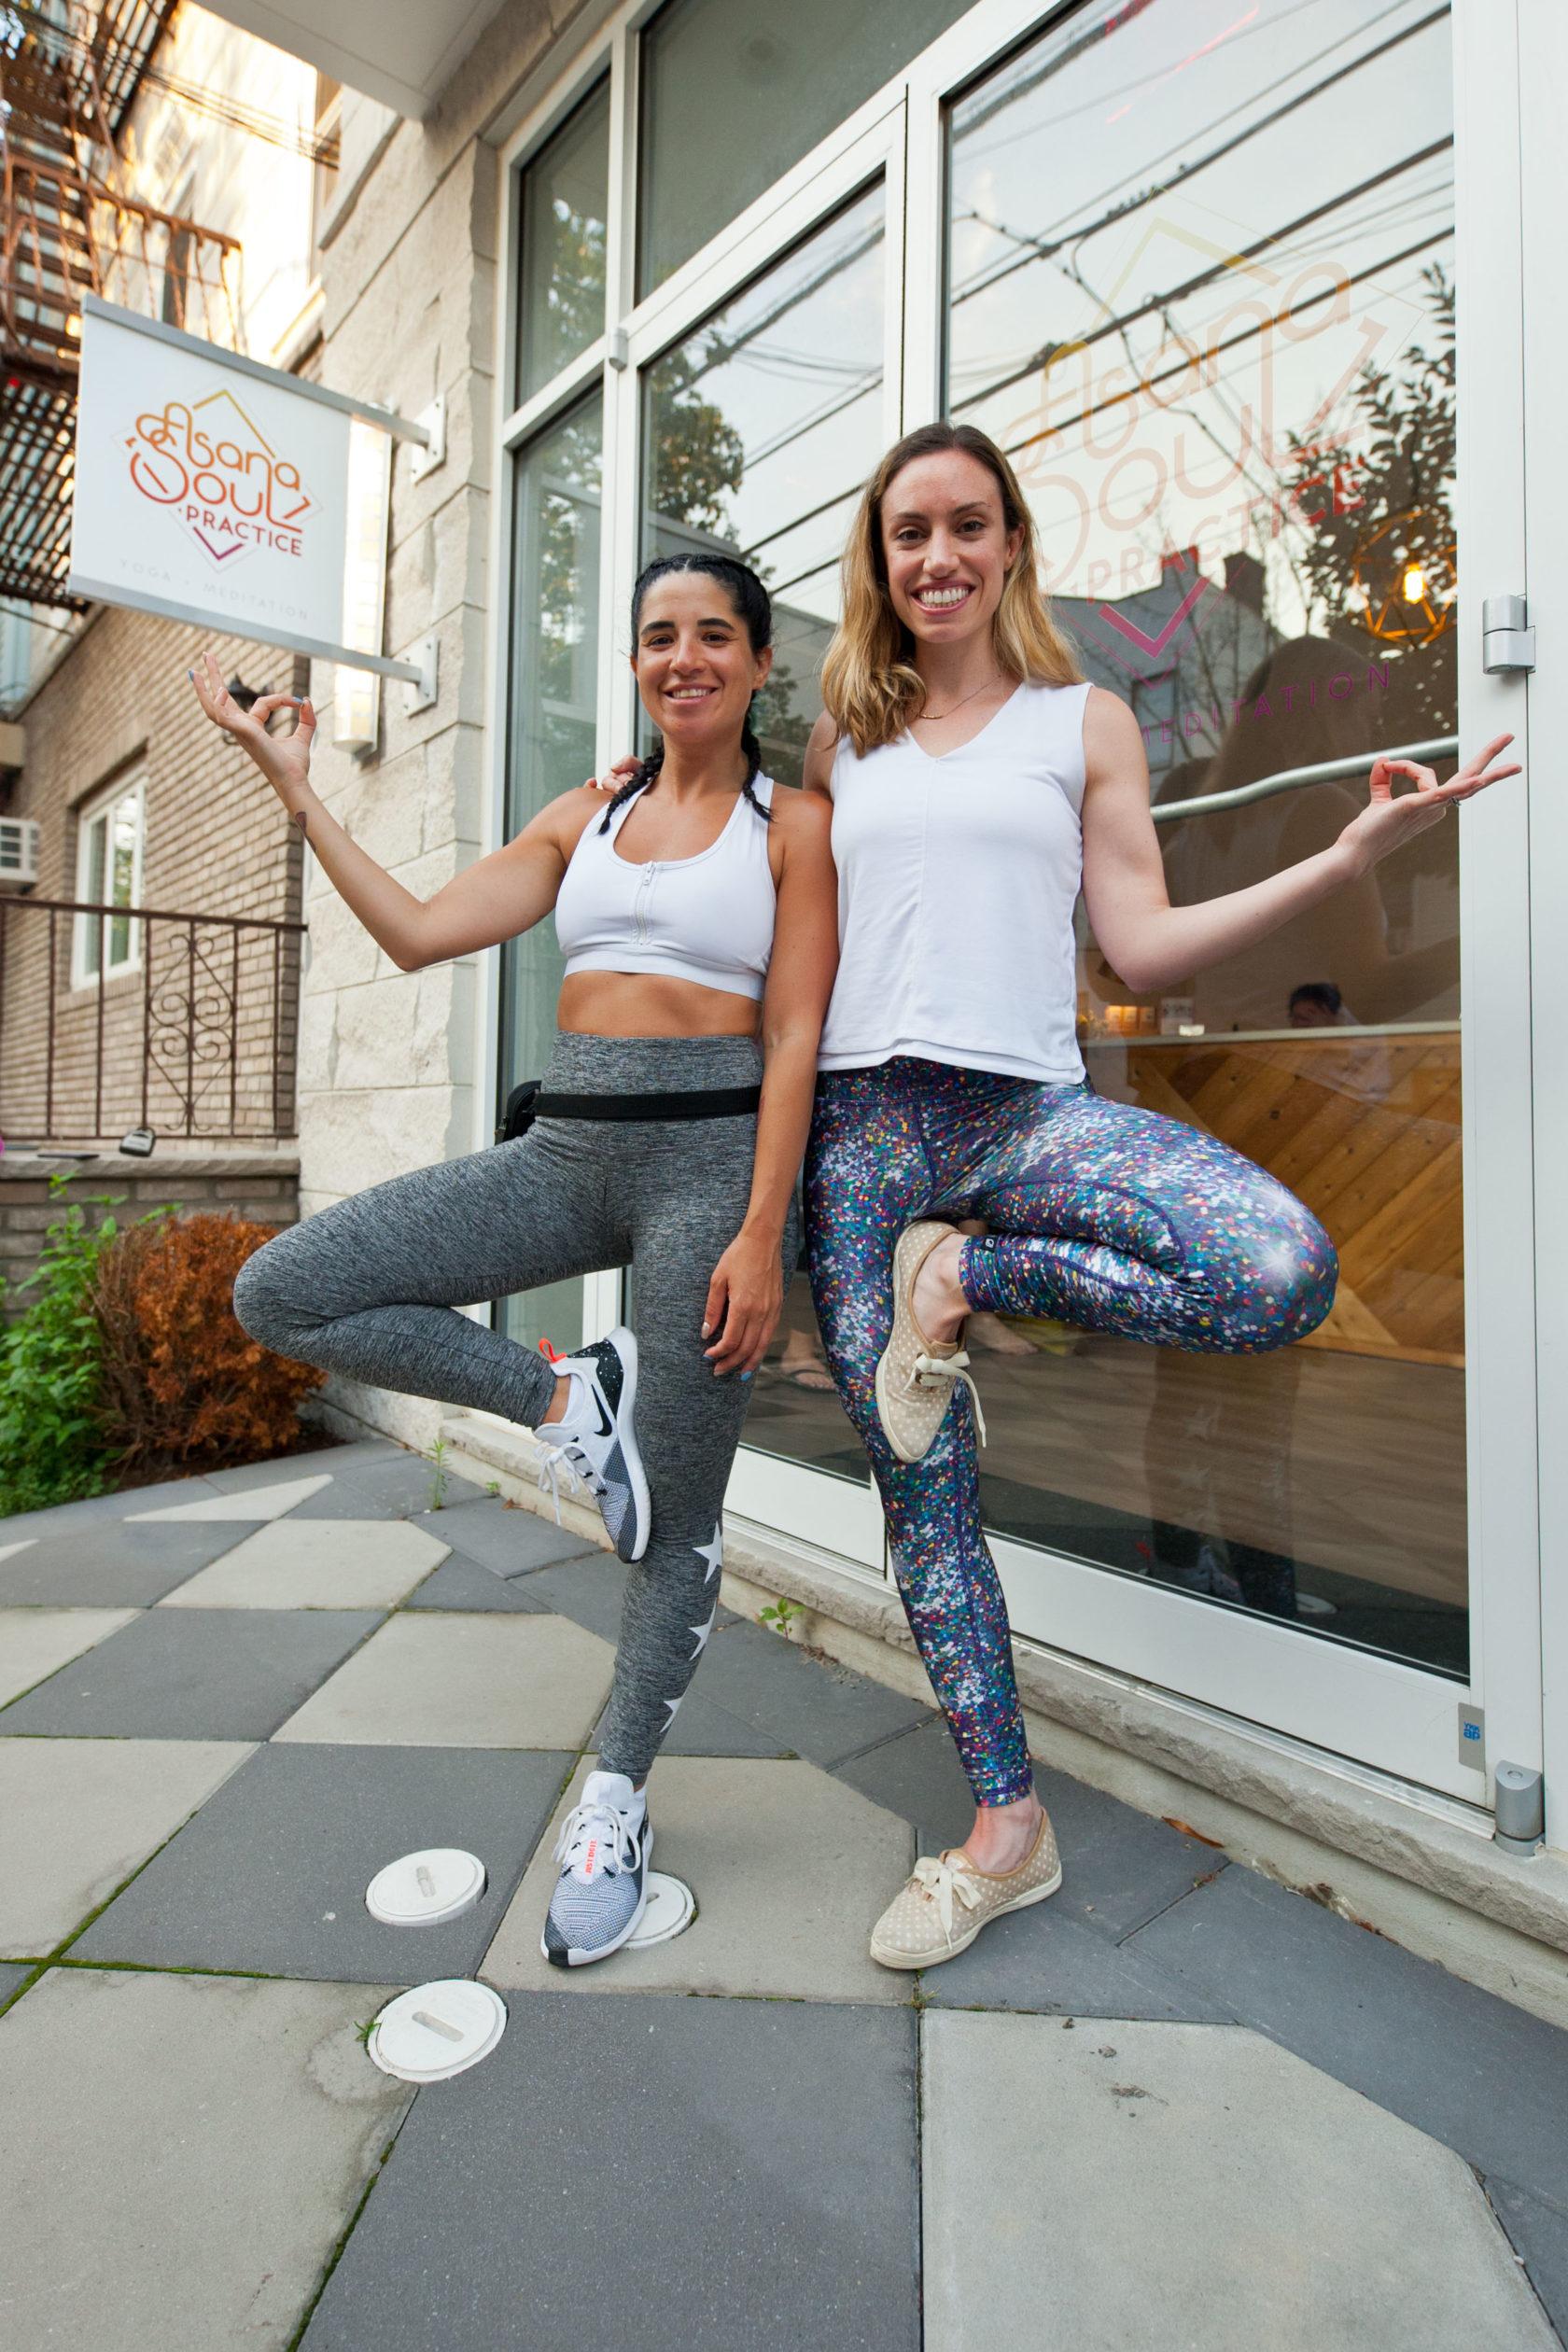 Asana Soul Practice Opens in Jersey City